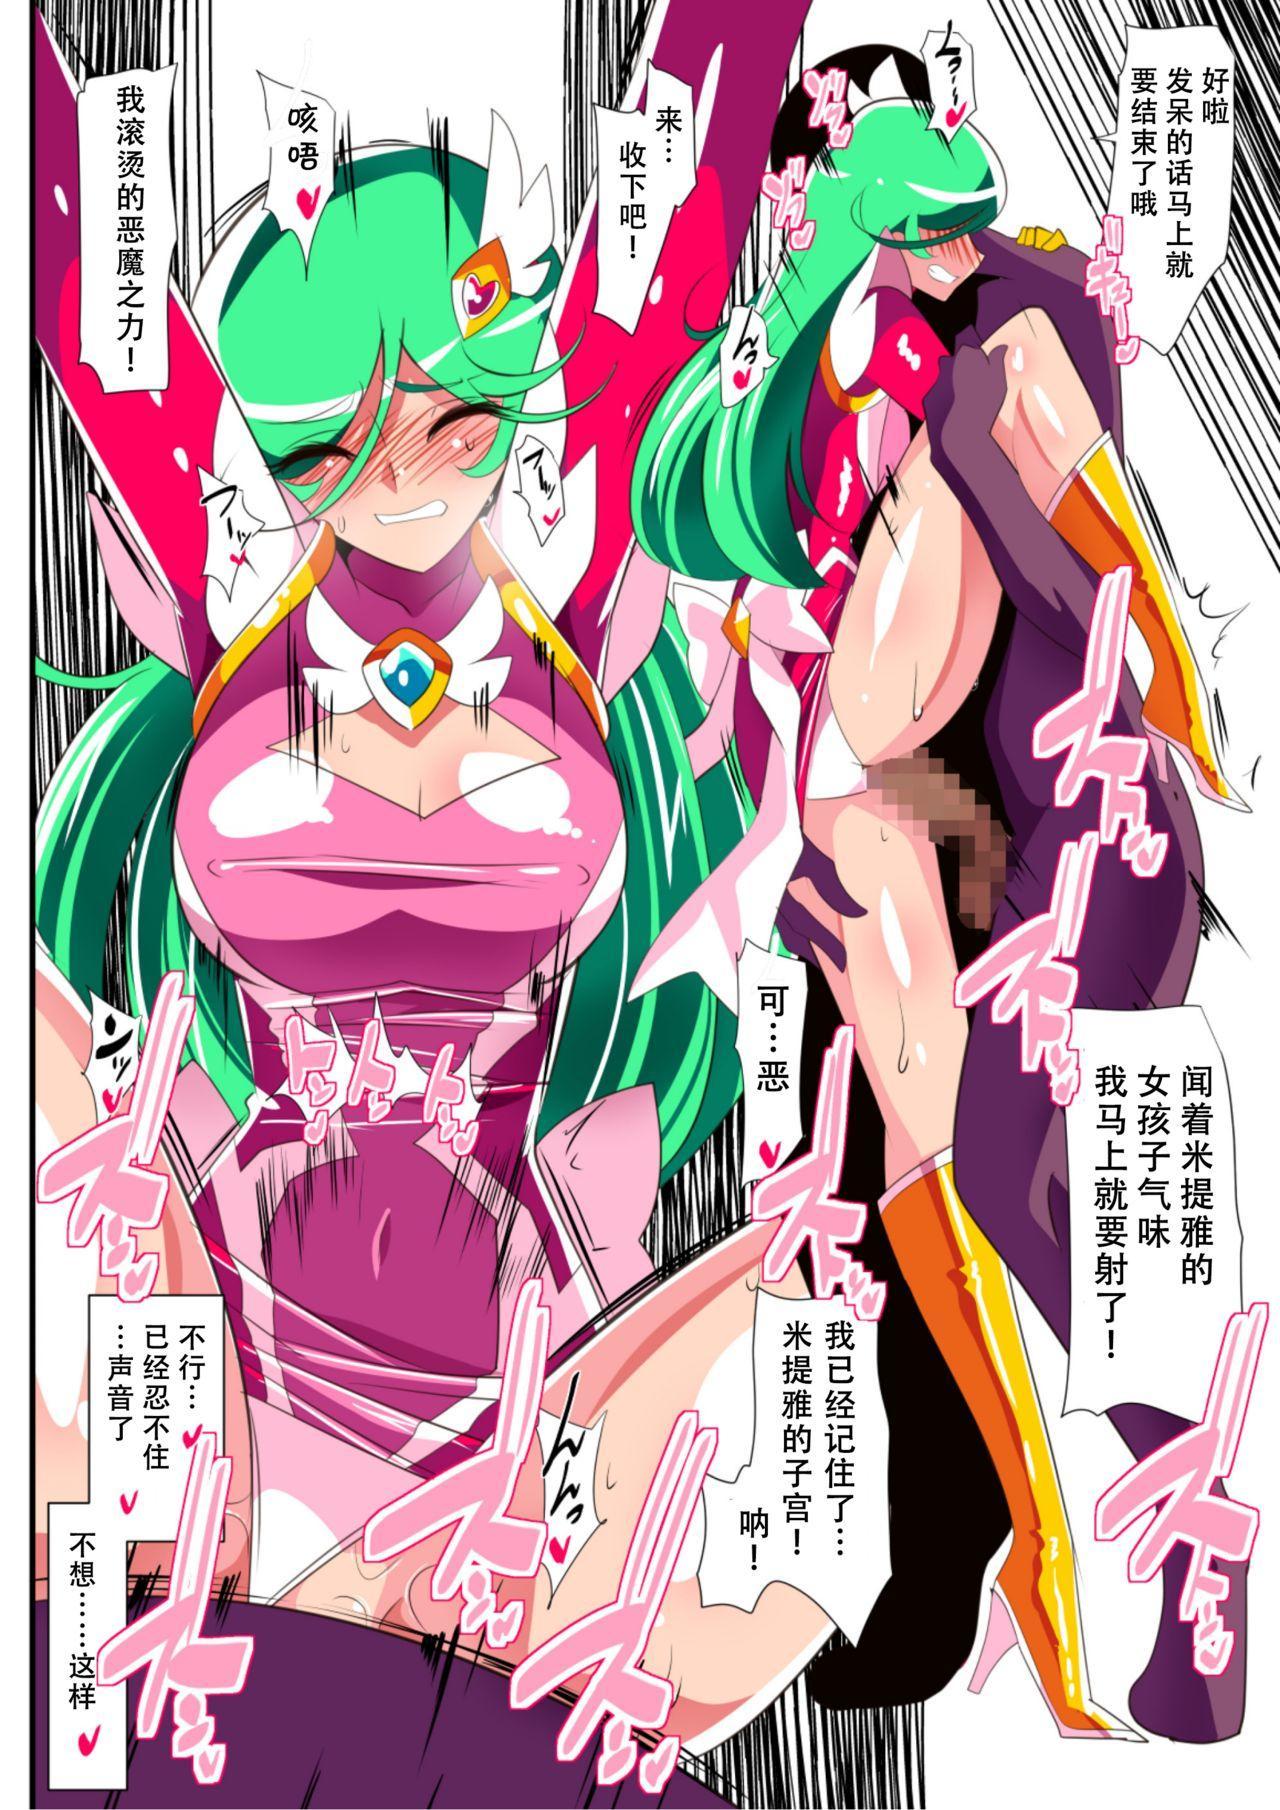 HEROINE LOSE 2 Psycho Lady Meteor Hen Psycho Power Heroine VS Kyousei Chikan Choukyou! 22